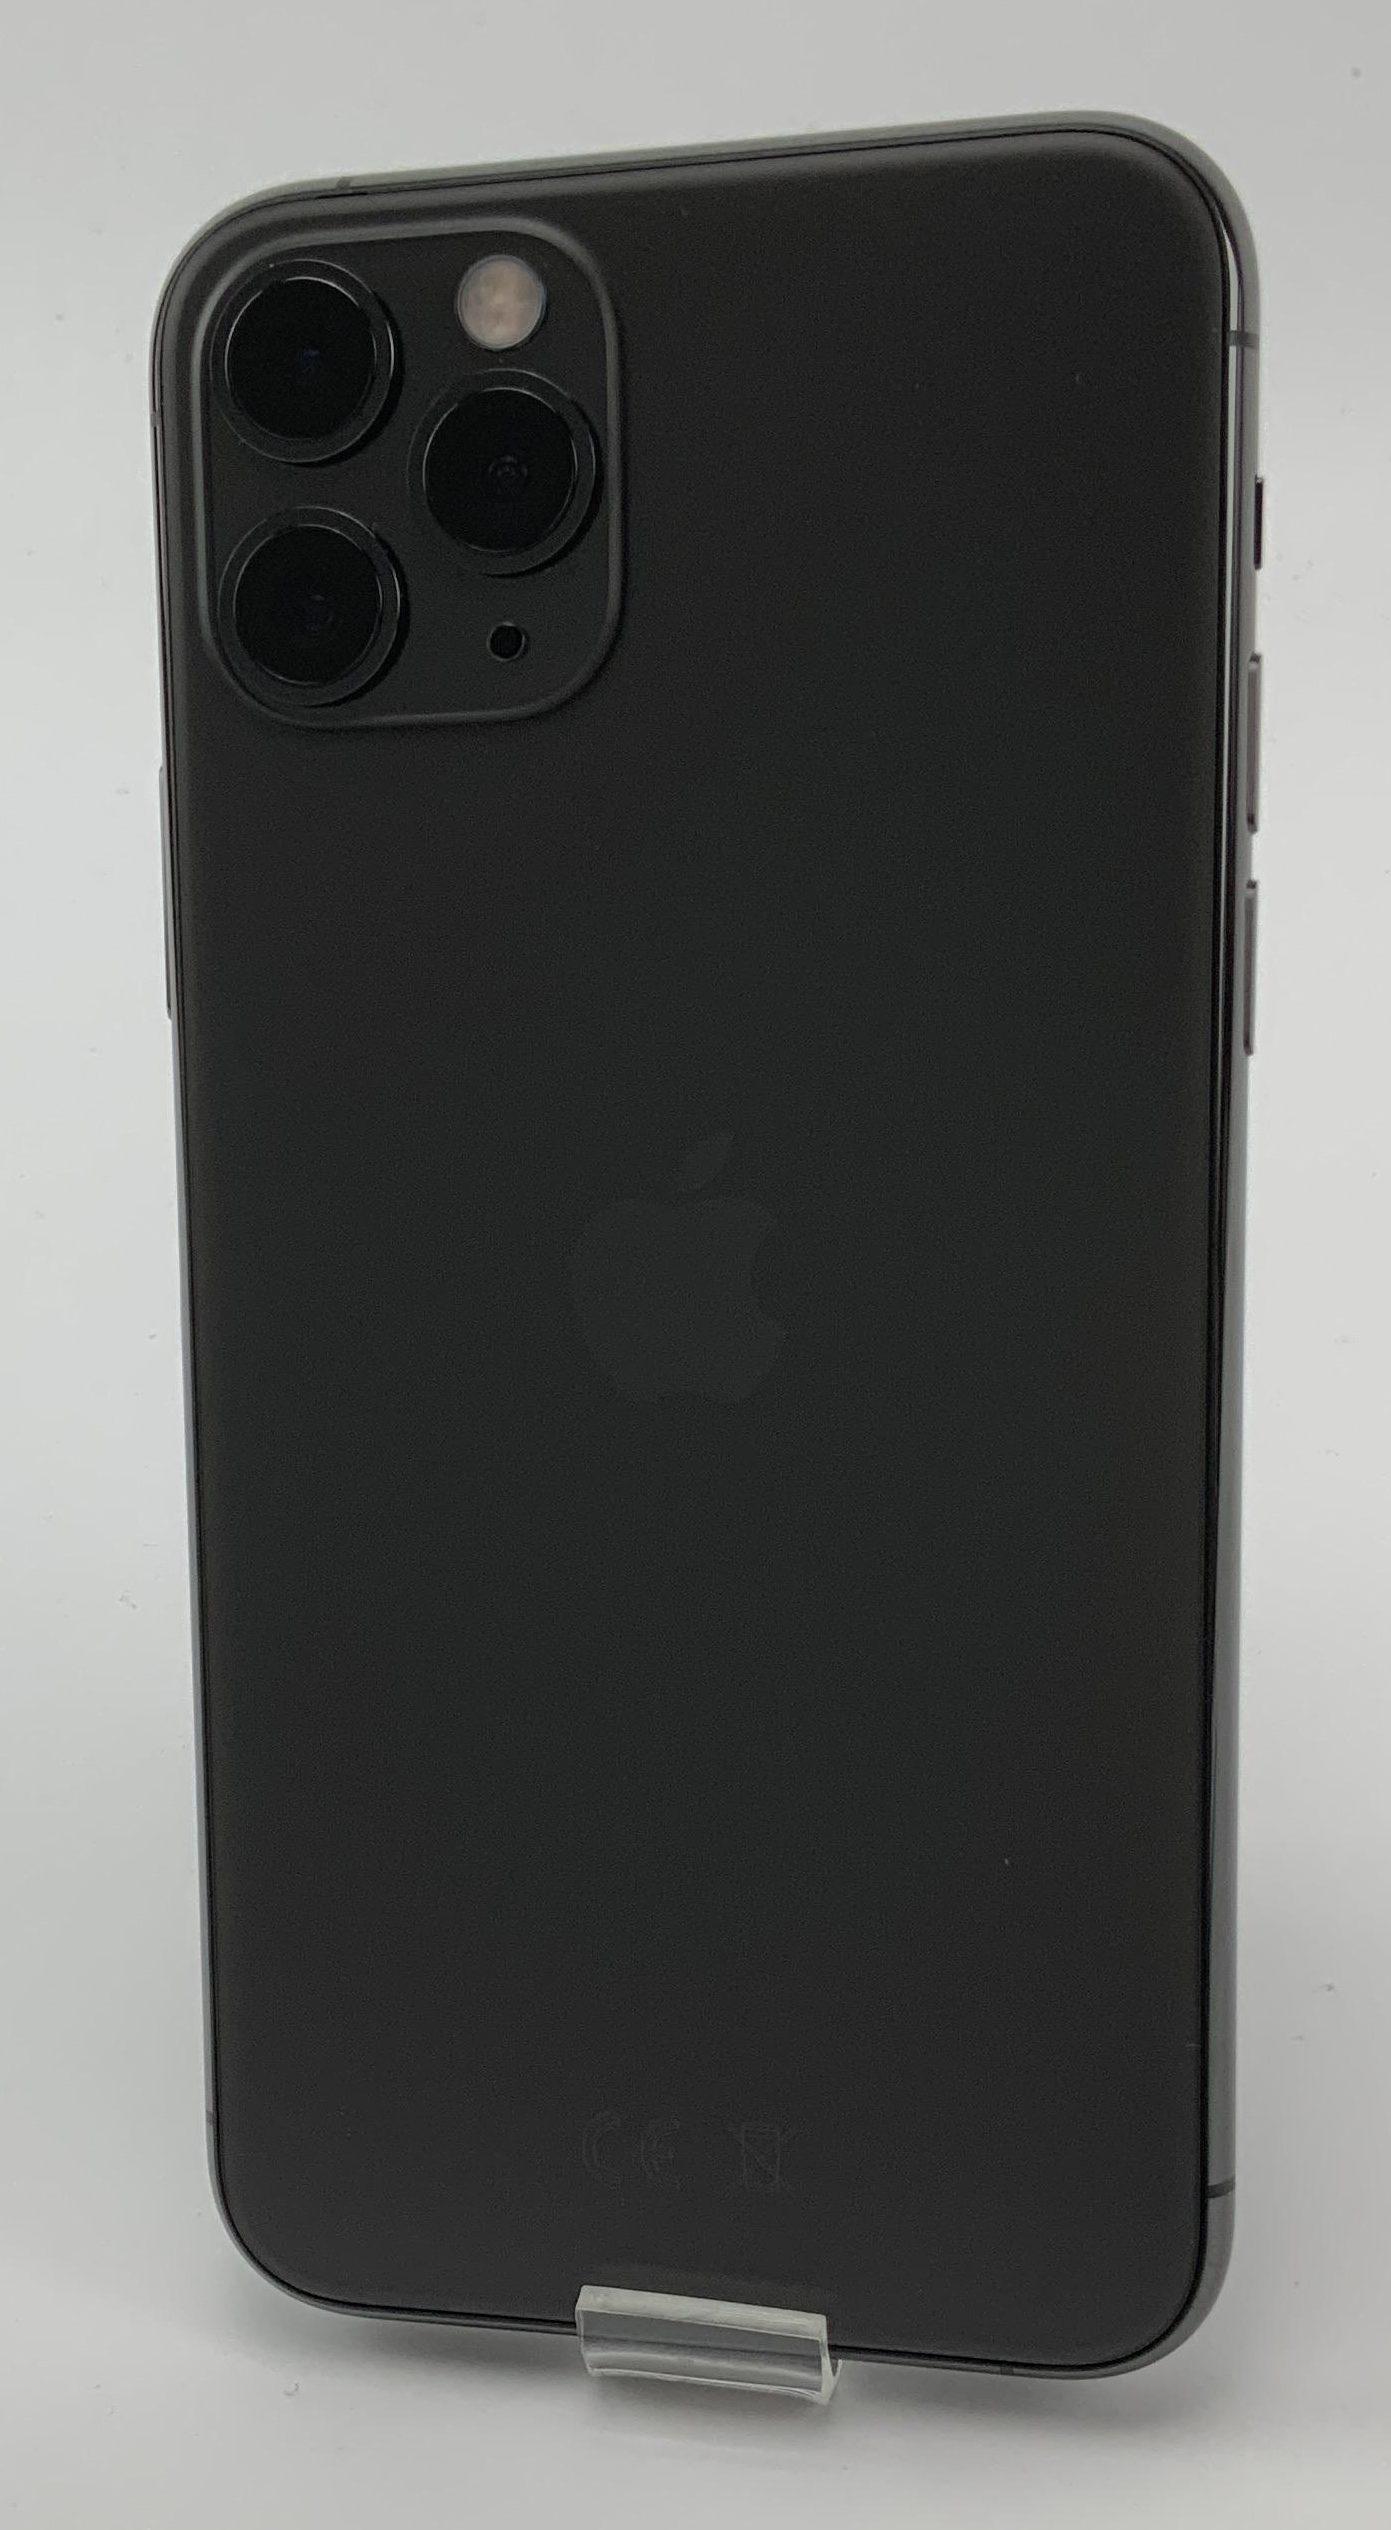 iPhone 11 Pro 256GB, 256GB, Space Gray, Afbeelding 2